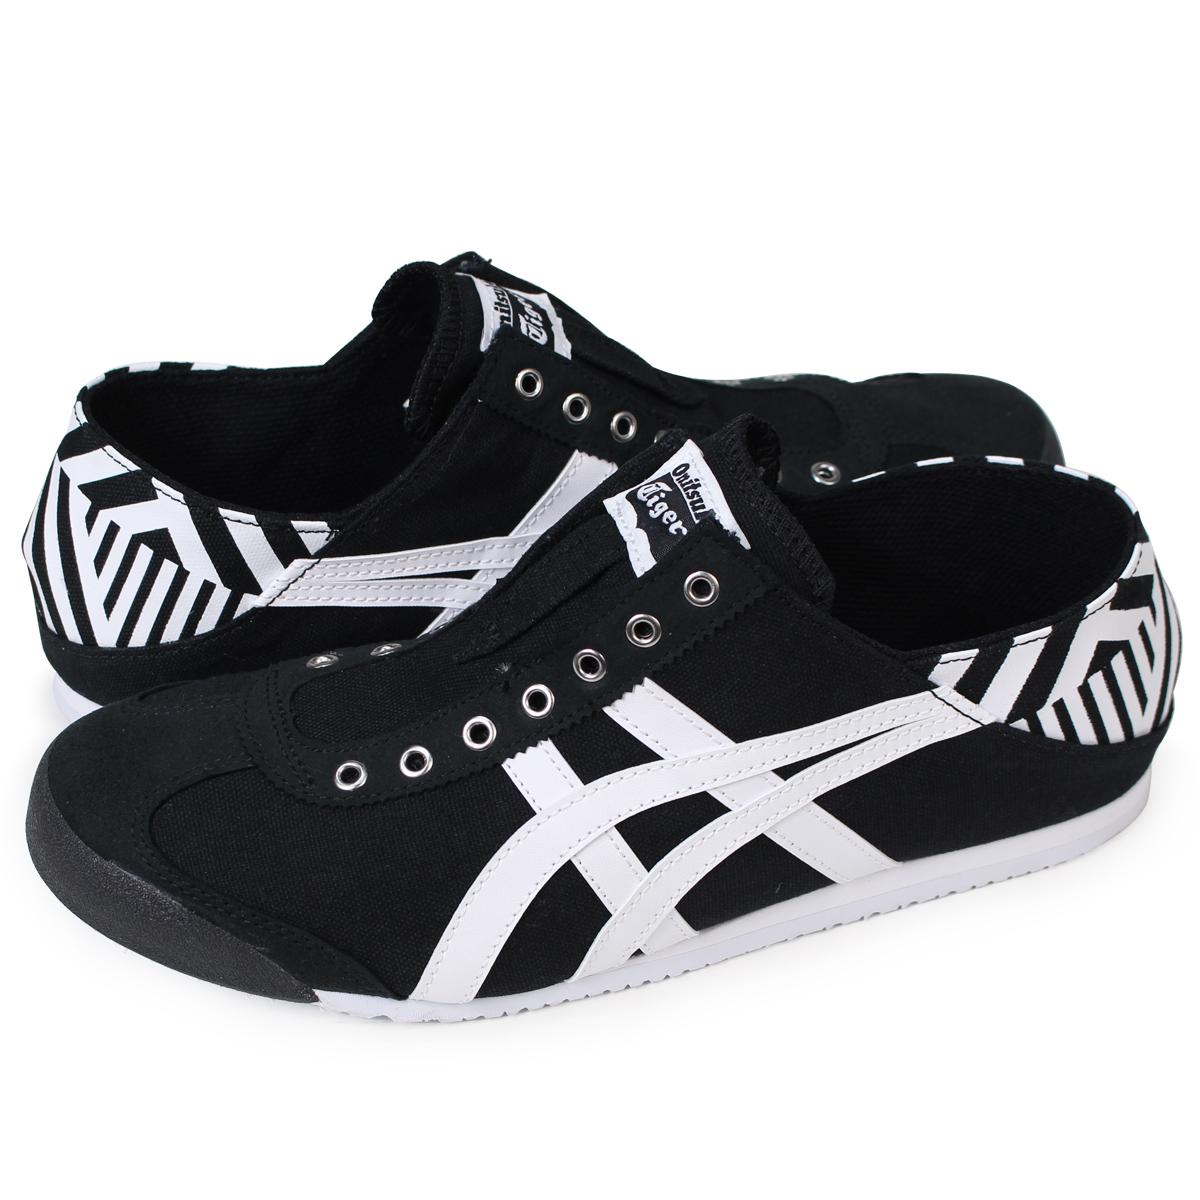 brand new d3fbc ac270 Onitsuka Tiger MEXICO 66 PARATY Onitsuka tiger Mexico 66 slip-ons men gap  Dis sneakers TH342N-9001 black